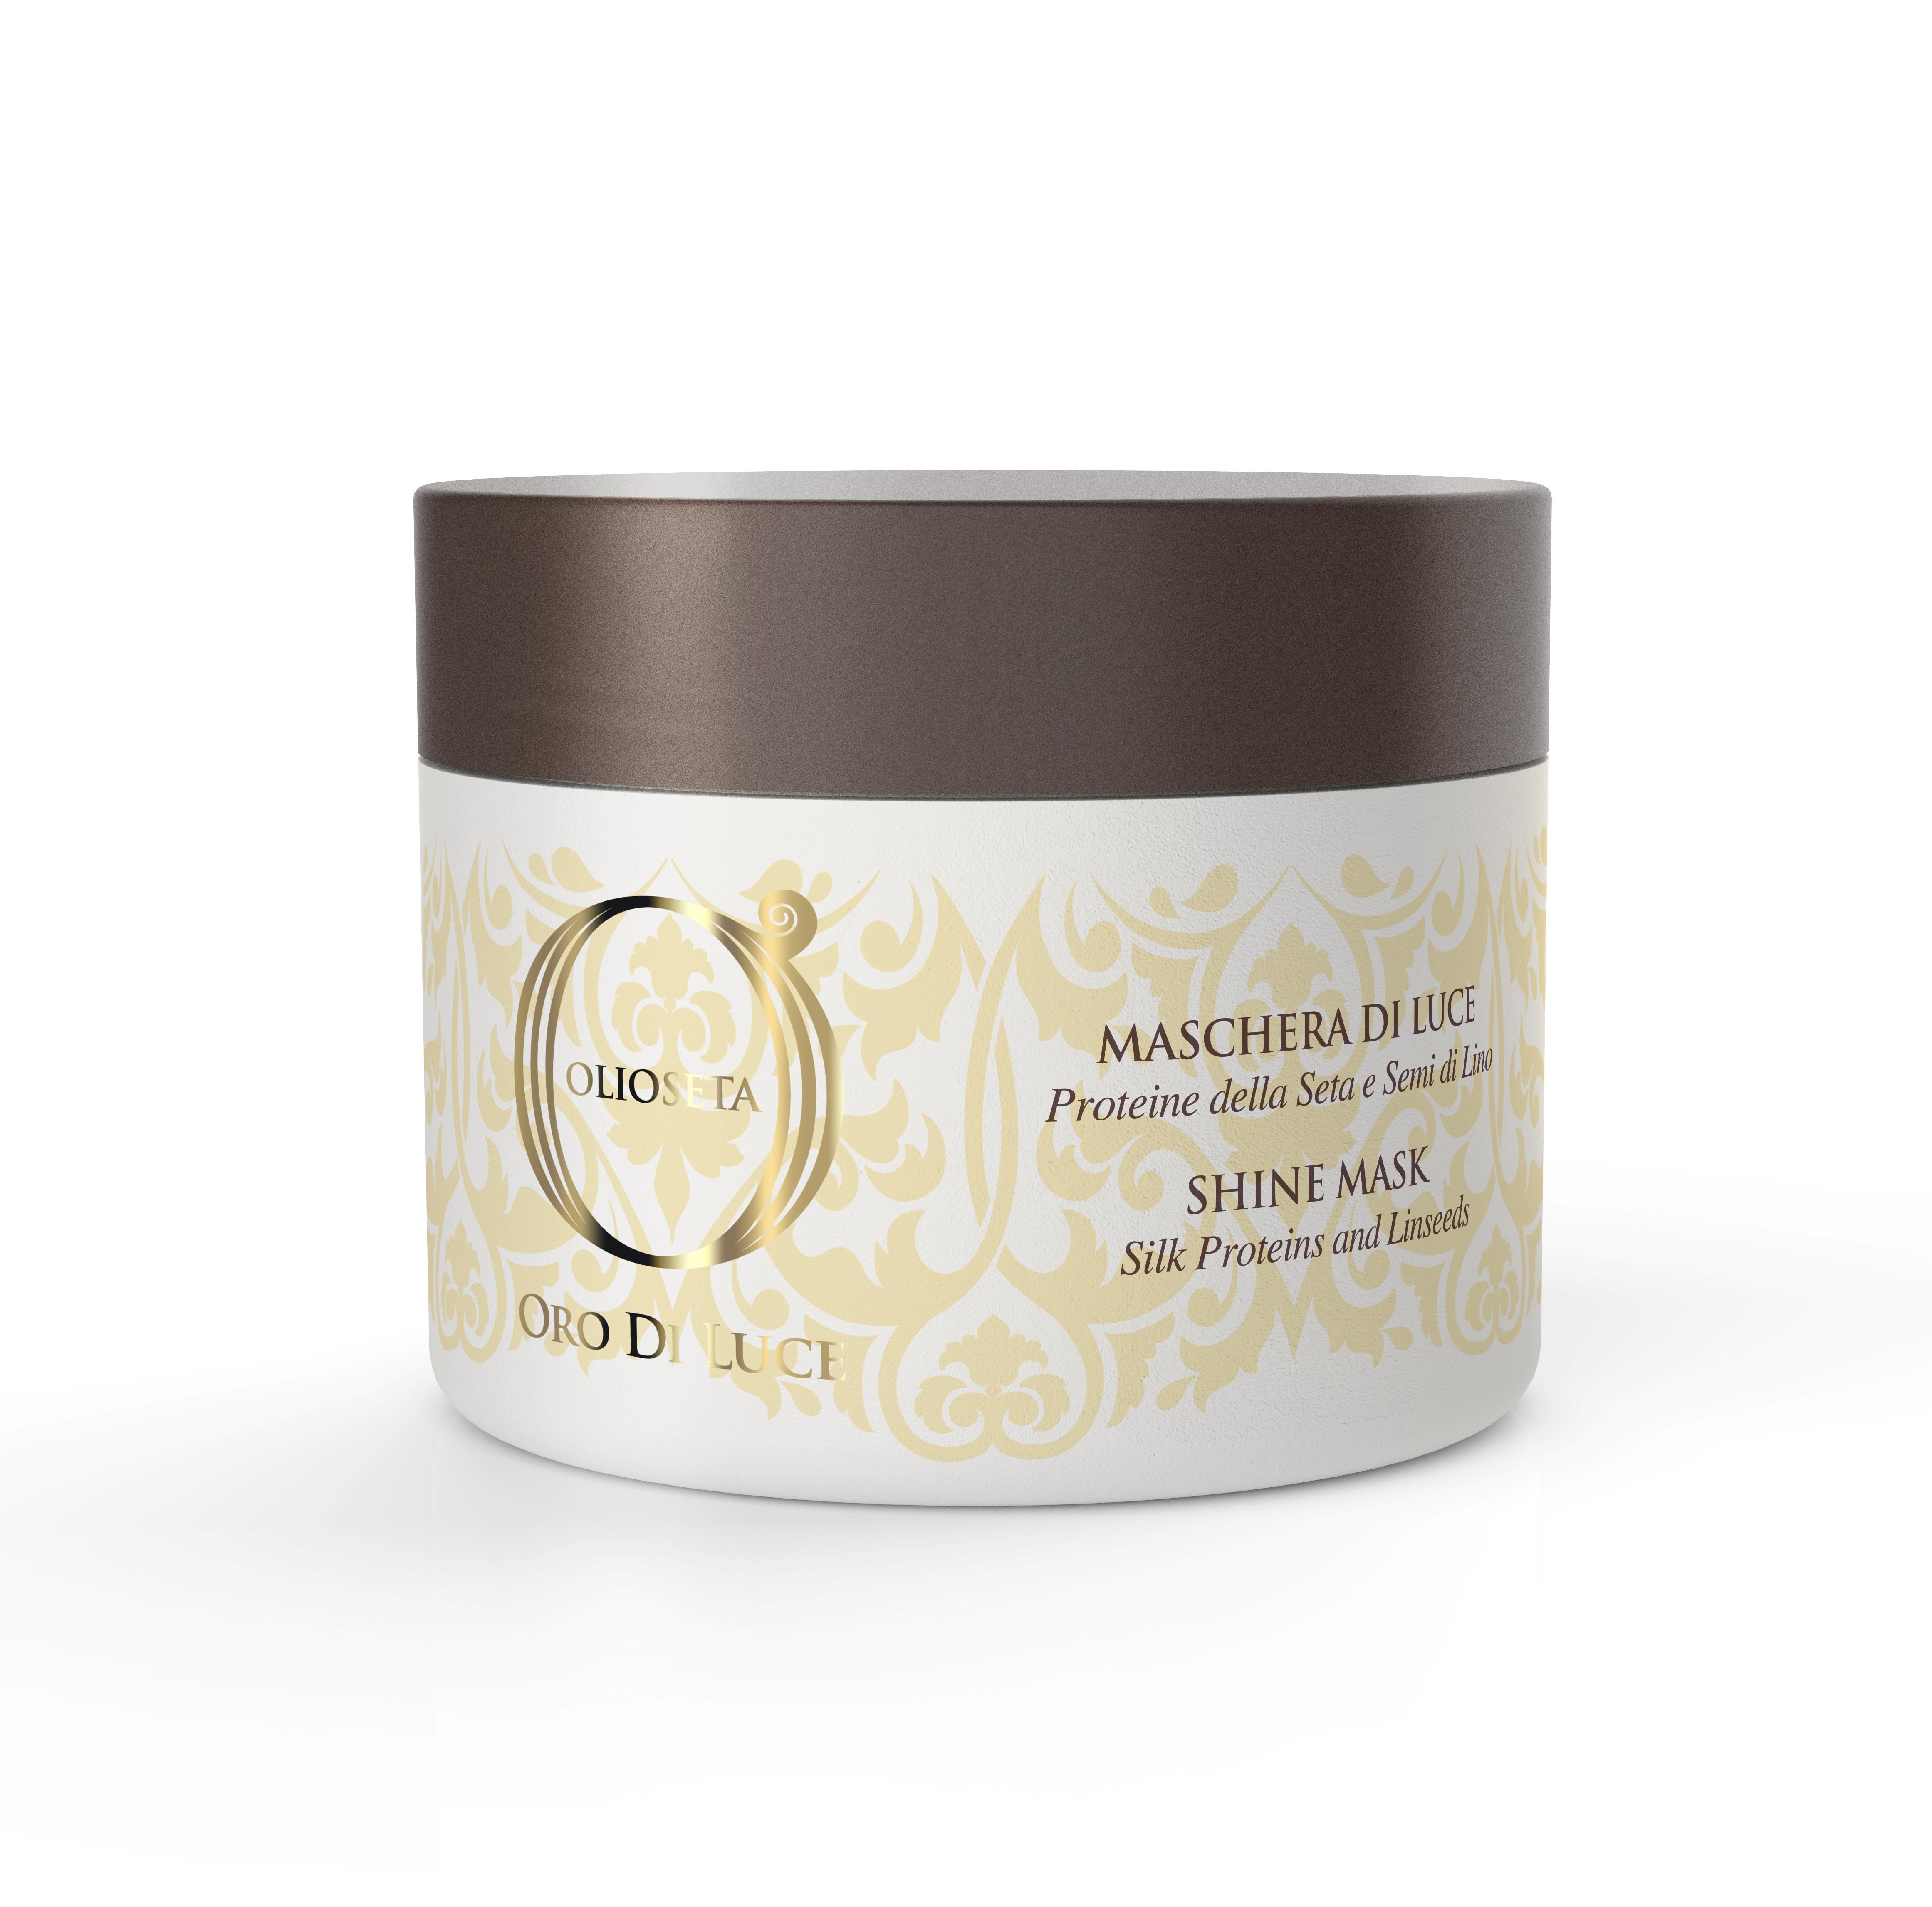 BAREX Маска-блеск с протеинами шелка и семенем льна / OLIOSETA ORO DI LUCE Shine mask 200 мл